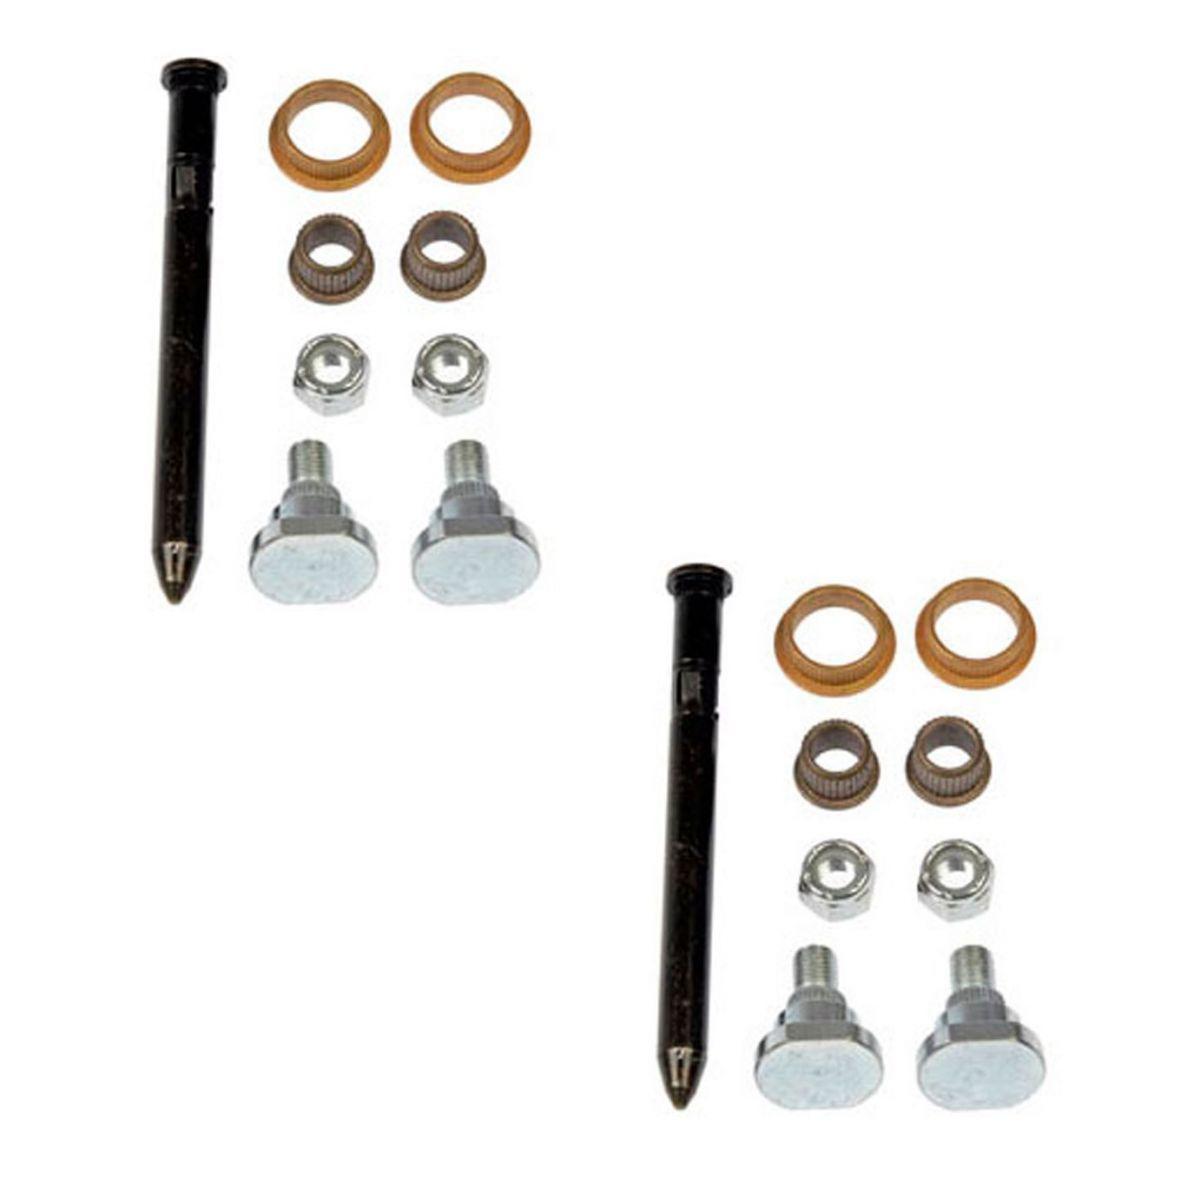 Dorman Upper /& Lower Door Hinge Pin /& Bushing Lock Nut Kit for Firebird Camaro